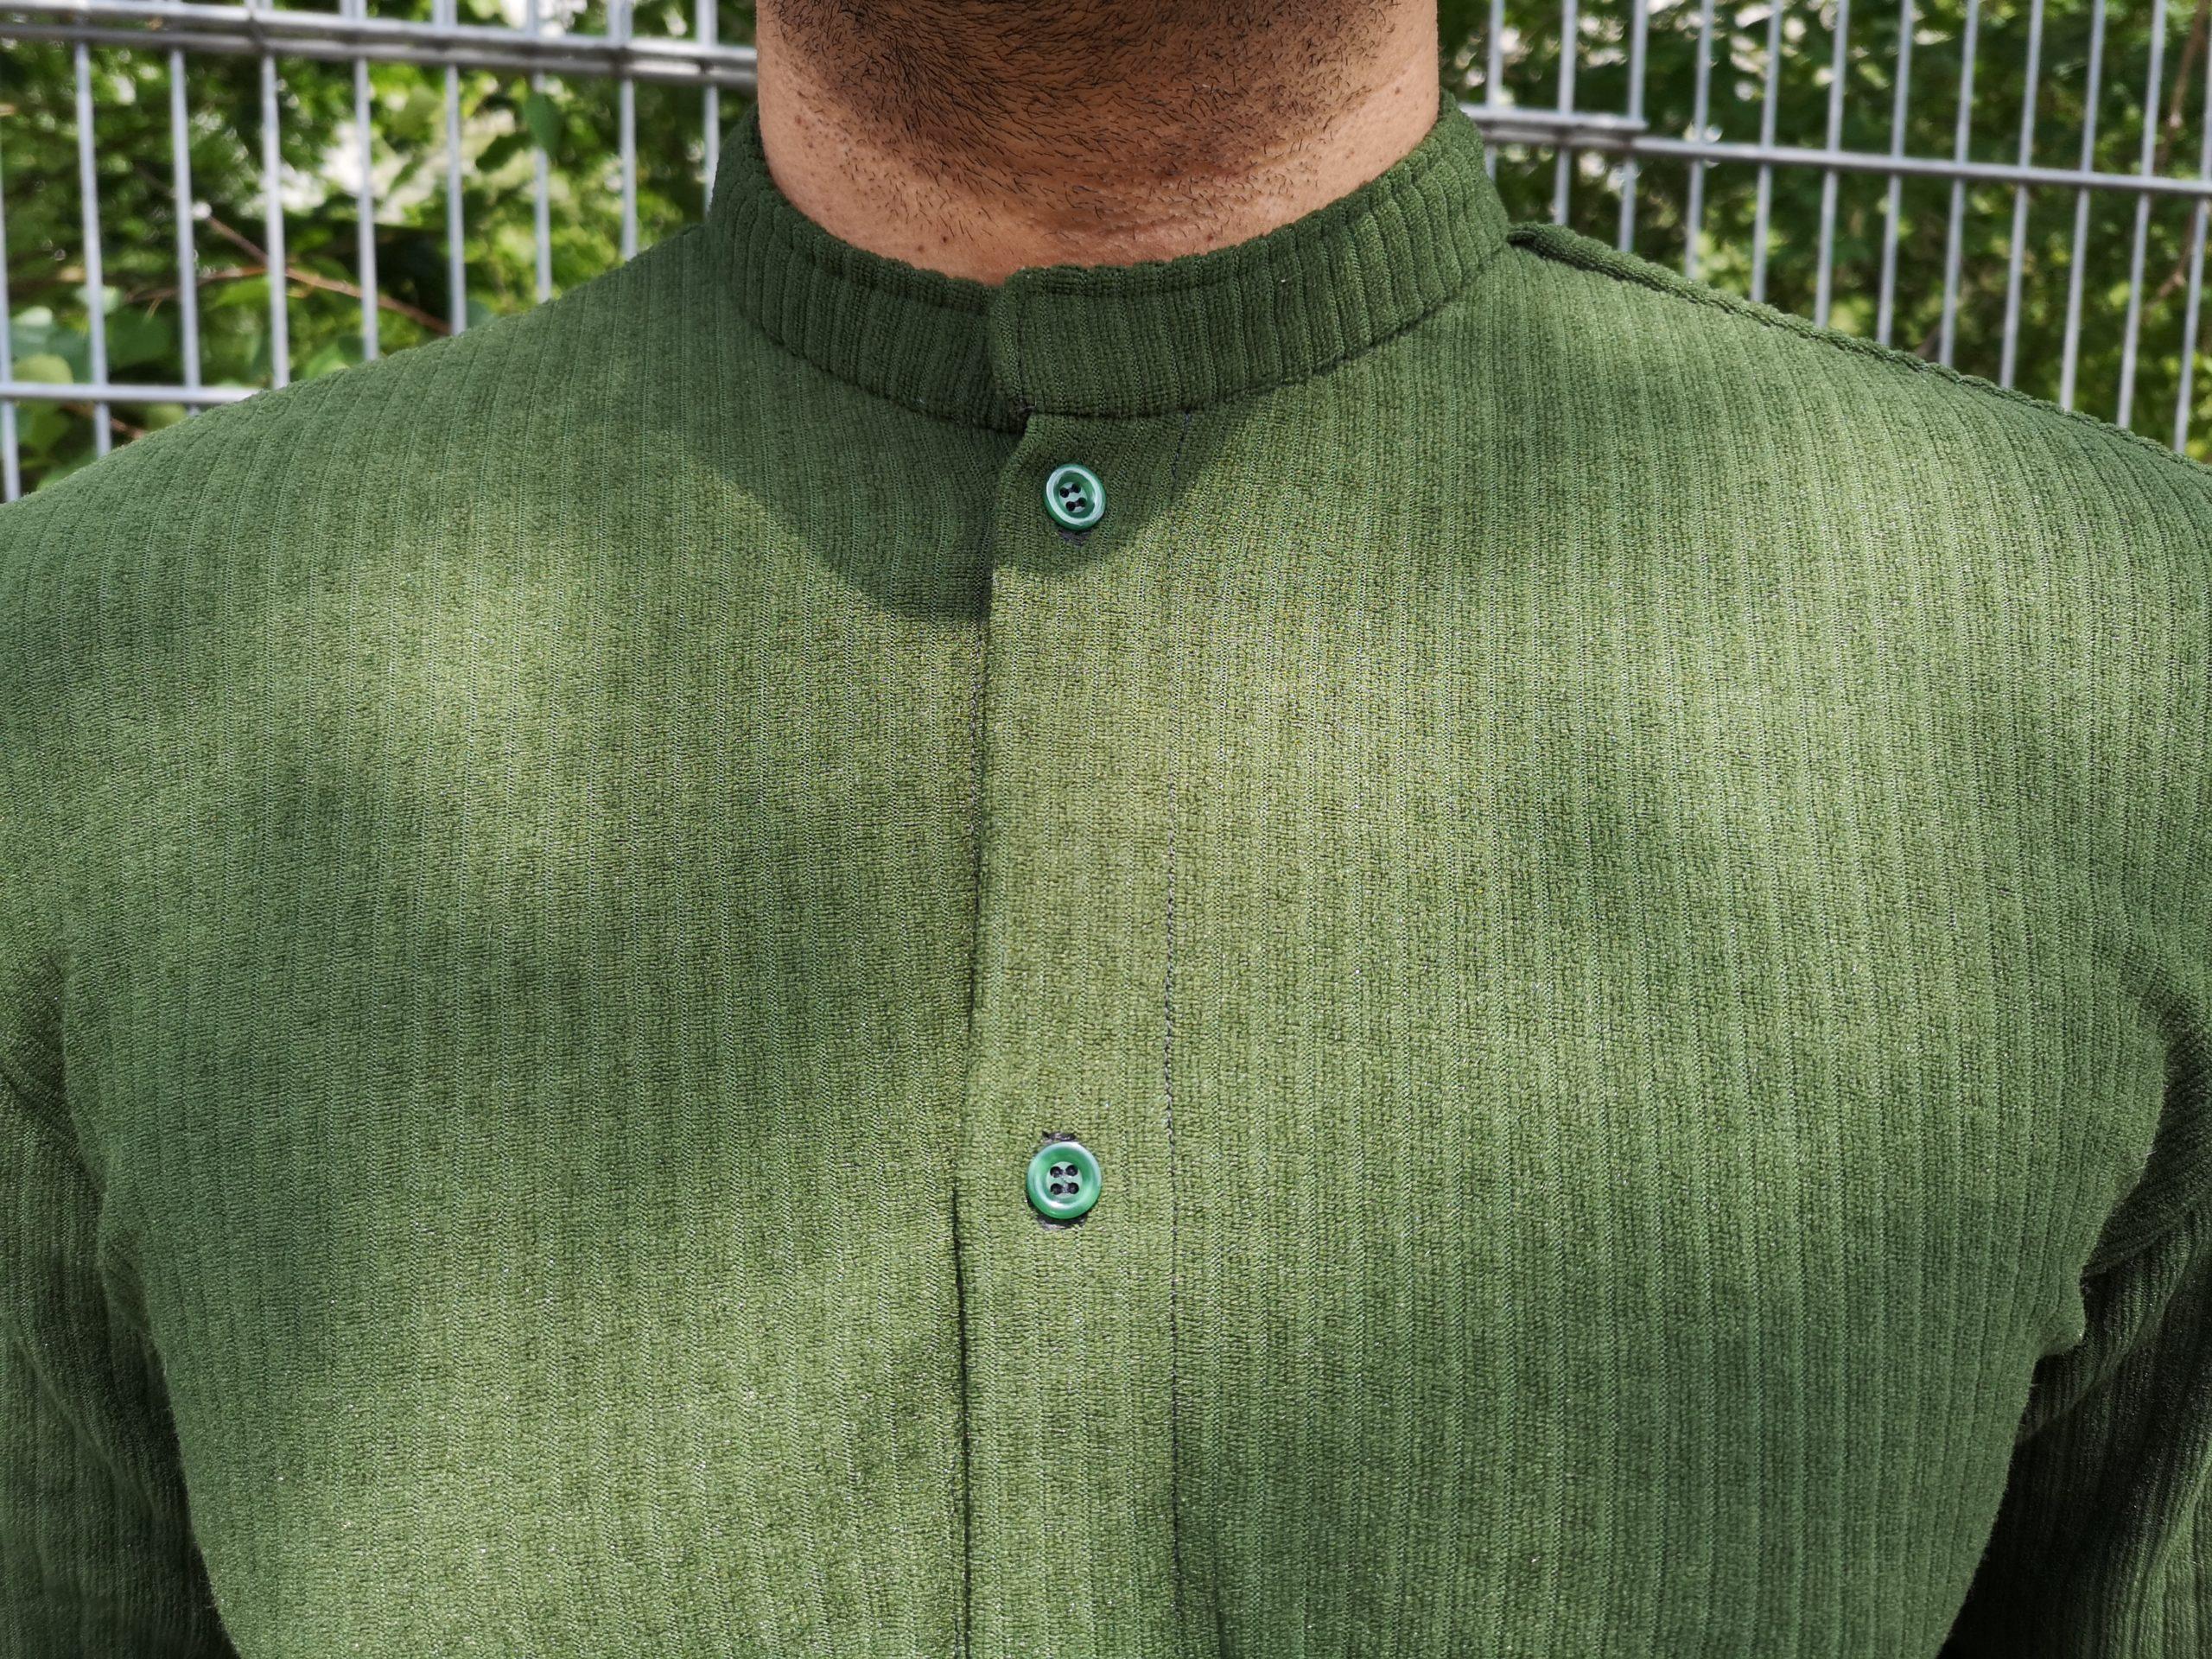 aynovo green blouse